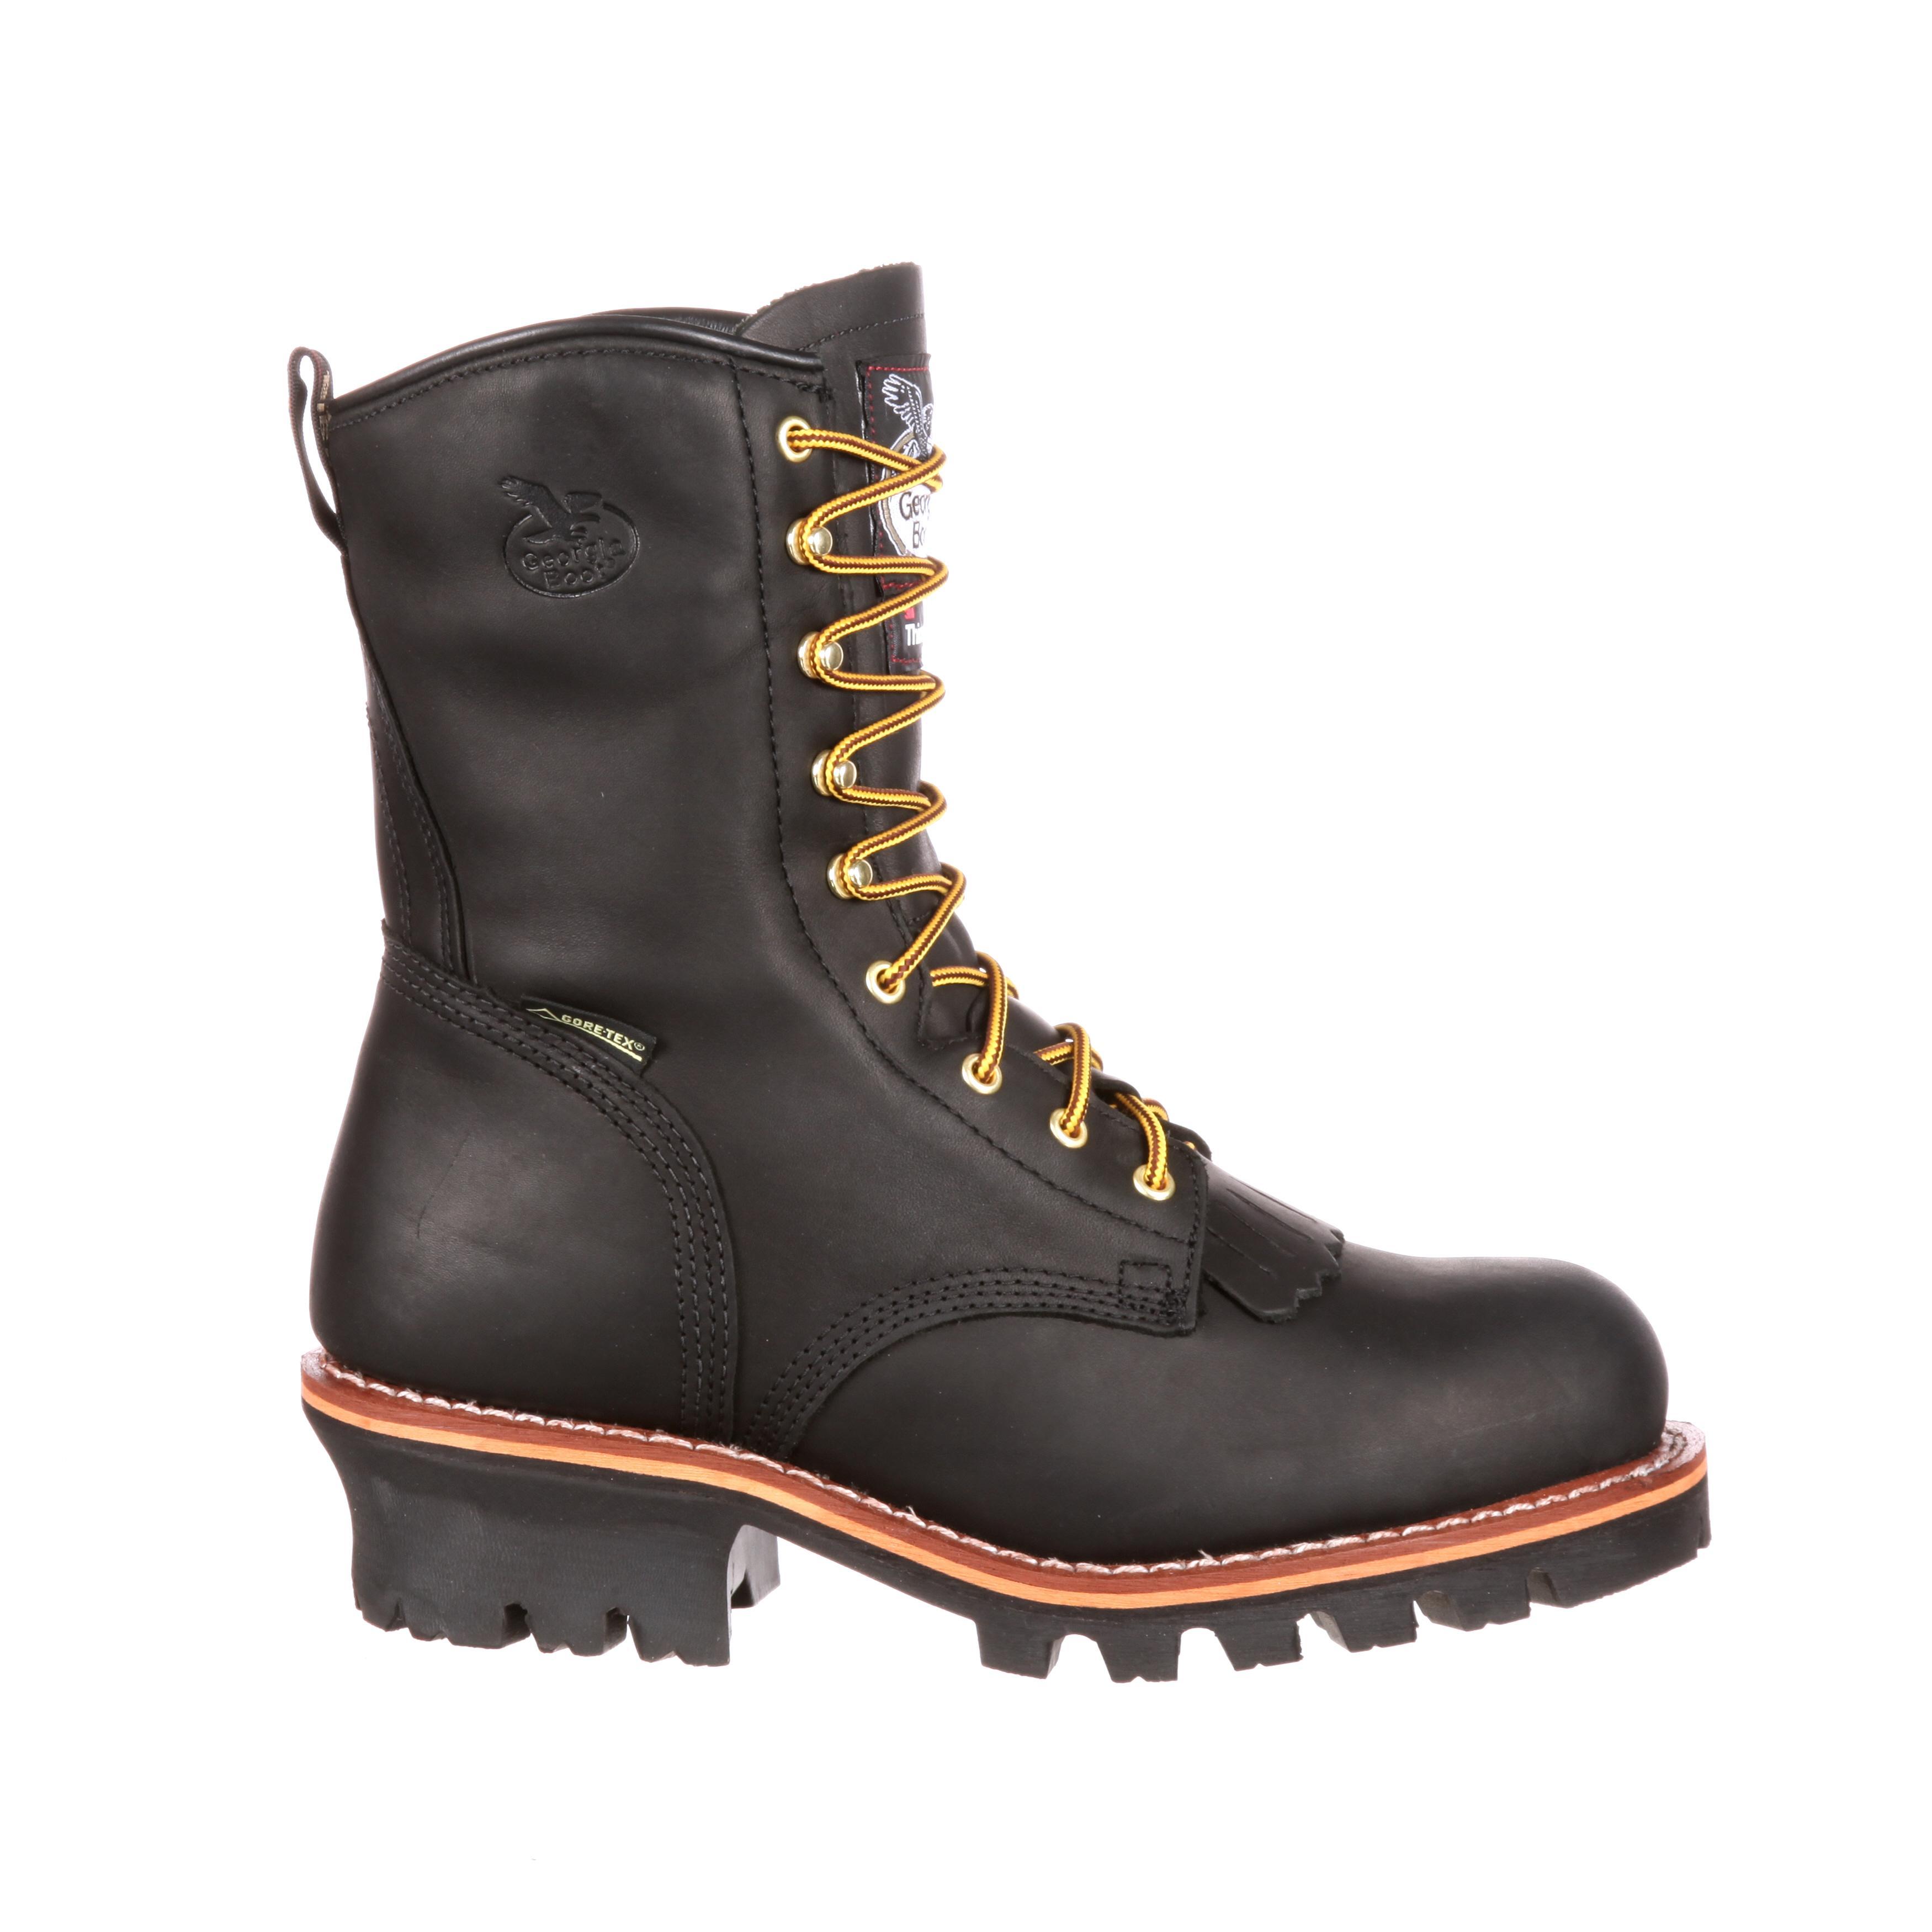 5113f774efe Georgia GORE-TEX® Waterproof Steel Toe Logger Boots